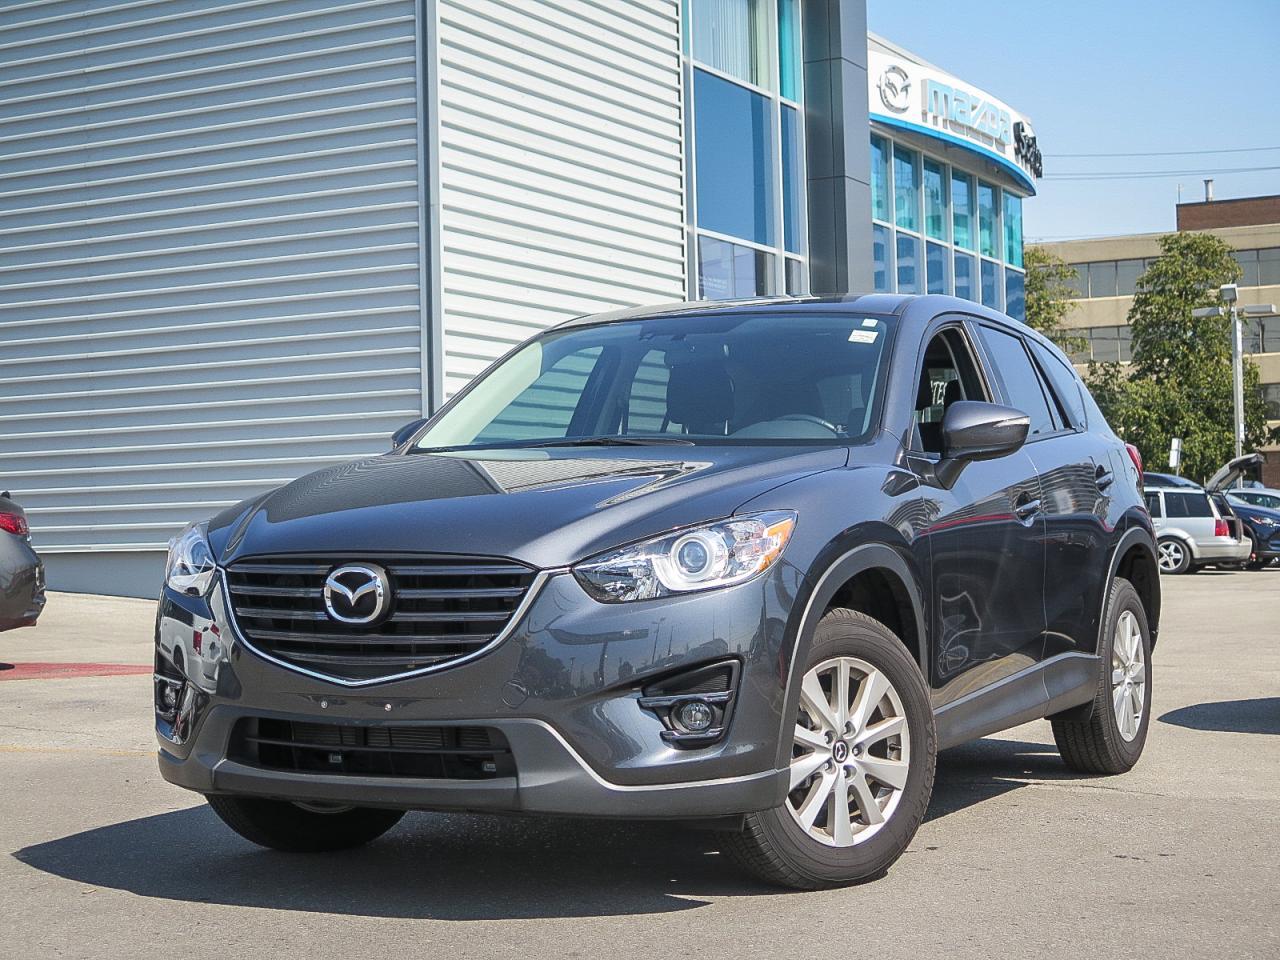 2016 Mazda CX-5 AWD LEATHER DEMO 0.9% FINANCE